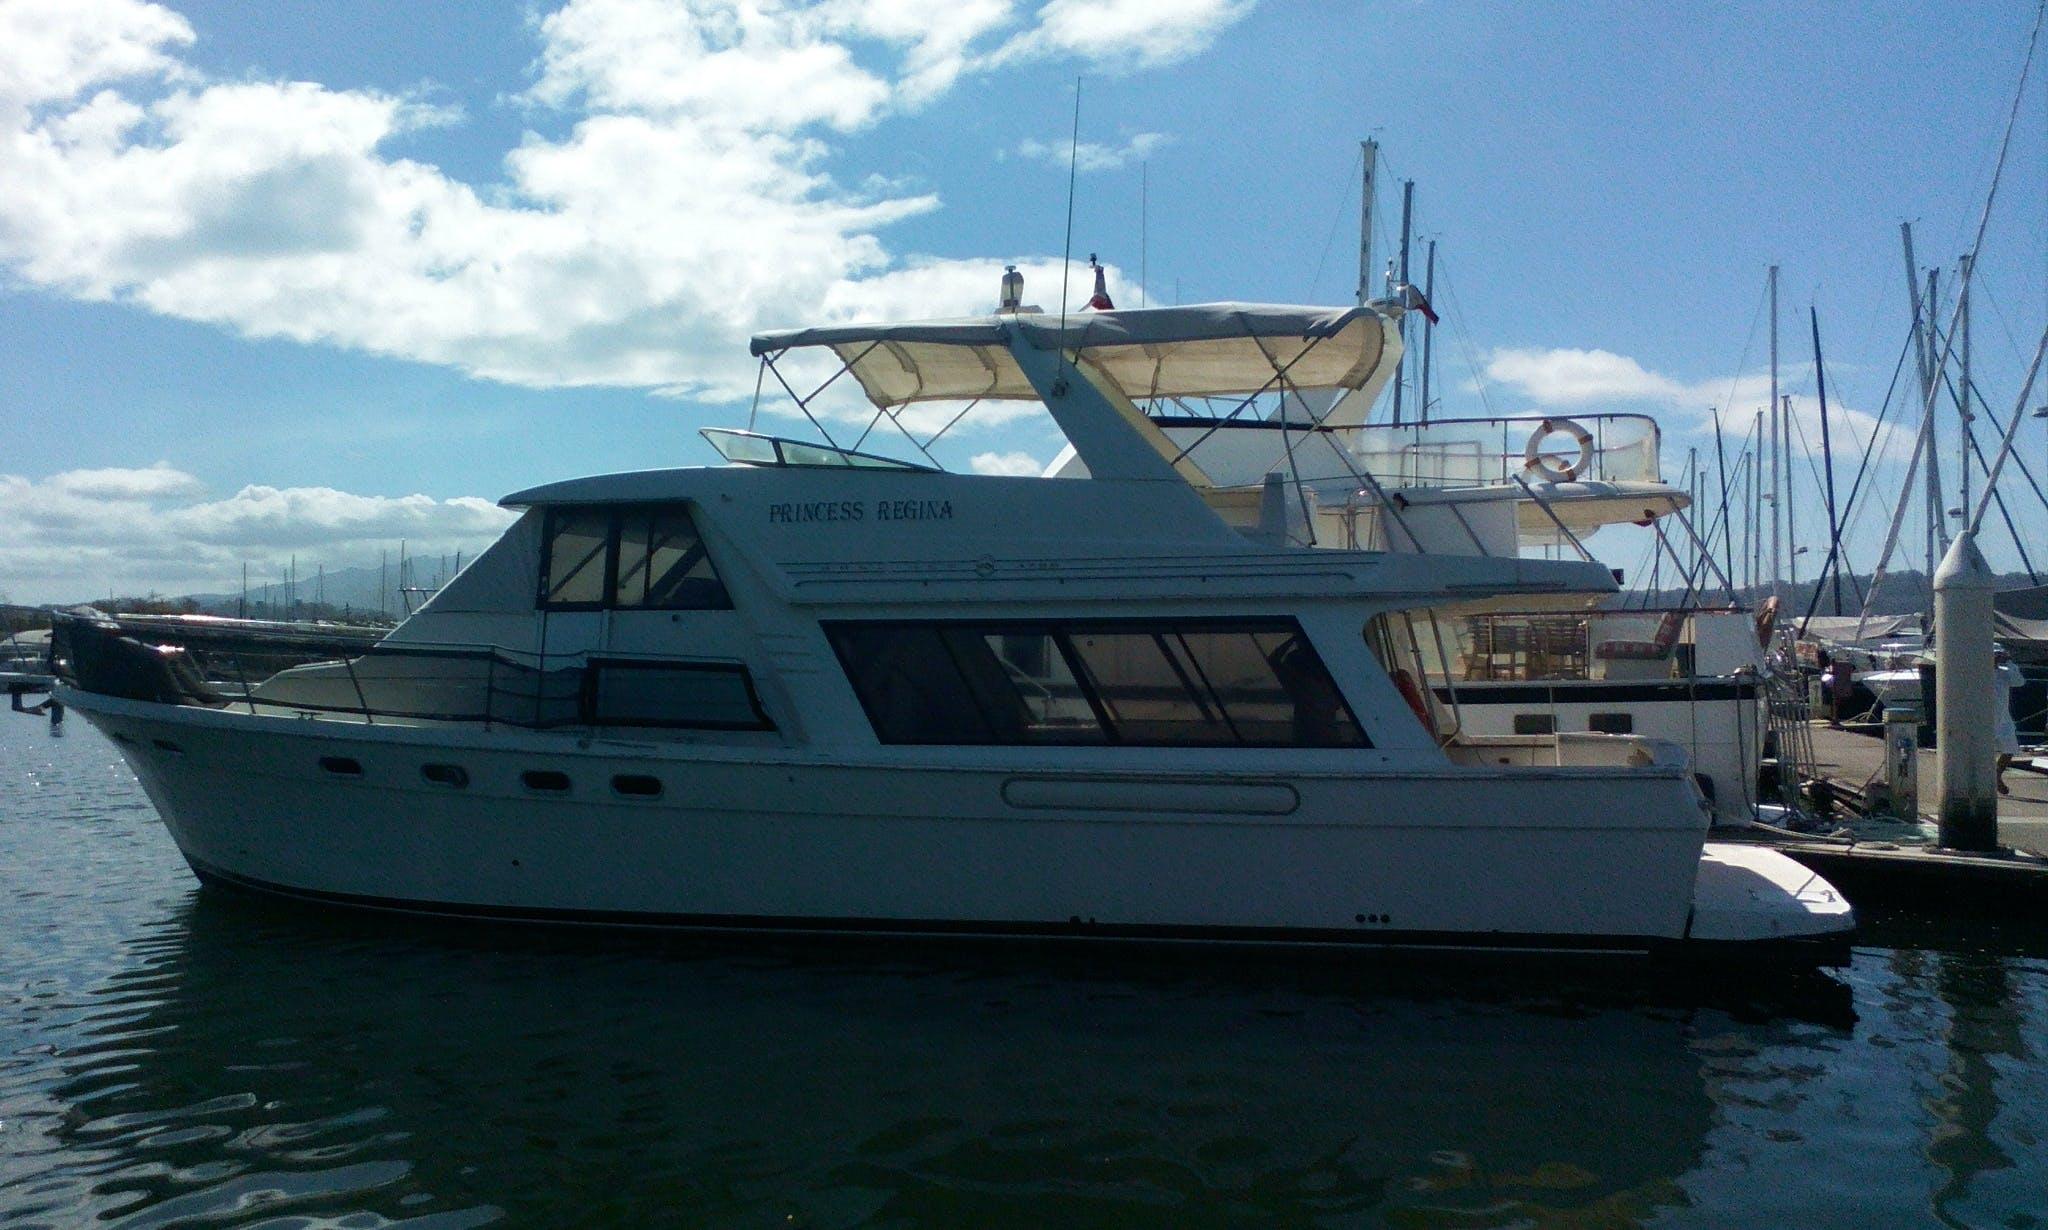 48' Motor Yacht Charter in Olongapo, Philippines